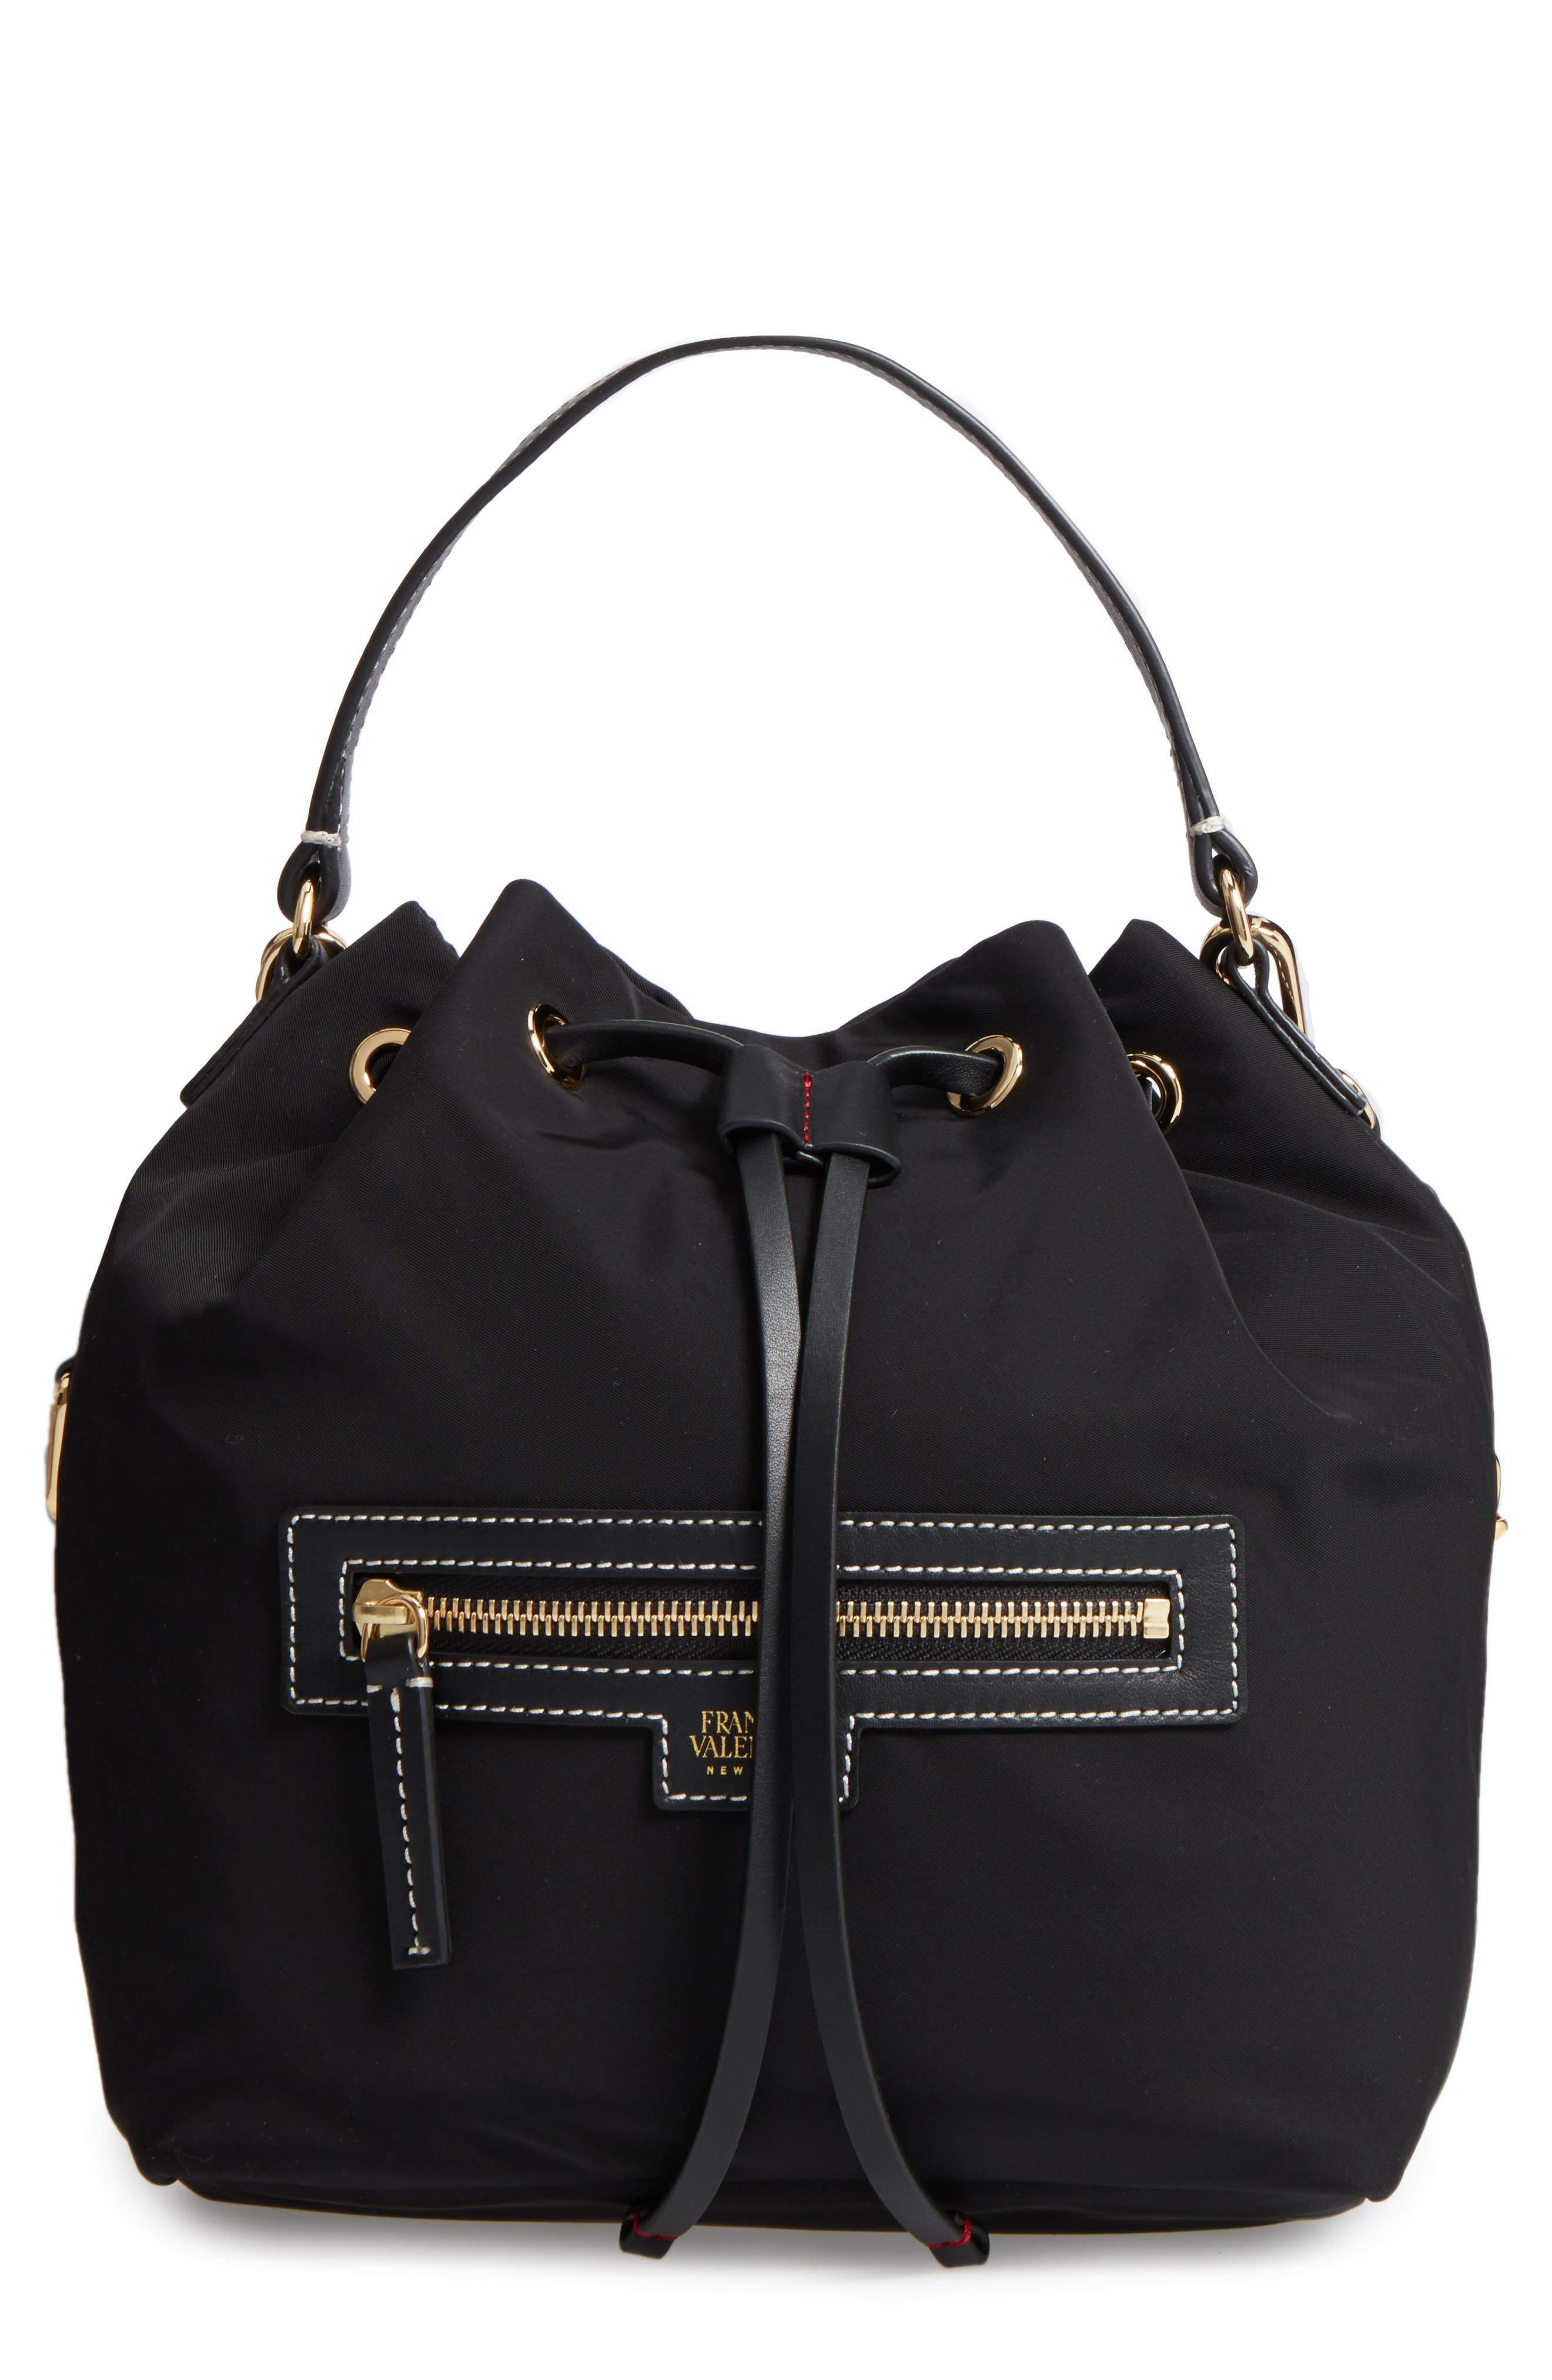 Medium Ann Nylon Bucket Bag,                         Main,                         color, 001